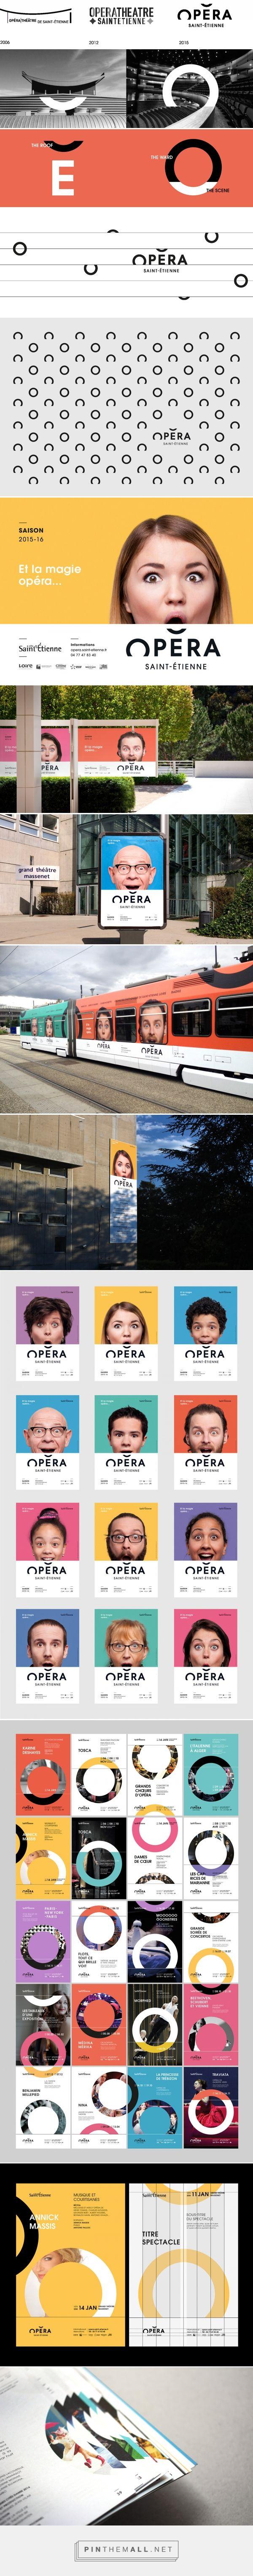 Saint Etienne Opera House - Brand design on Behance - created via http://pinthemall.net